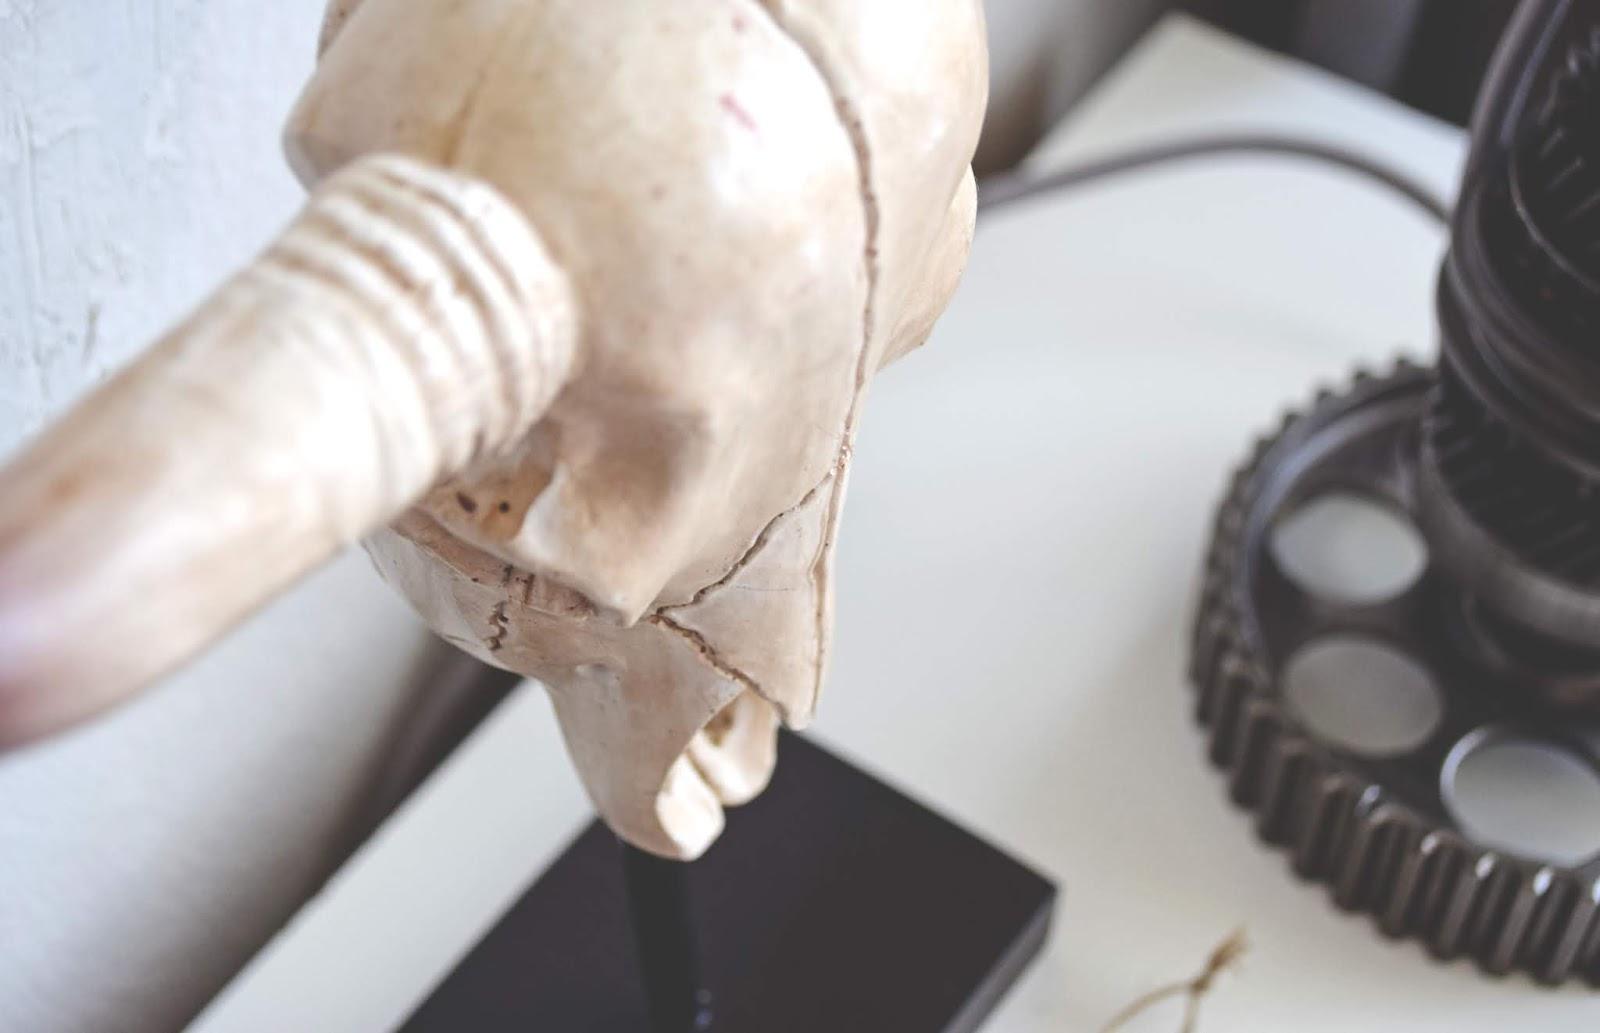 Lampa dla mechanika